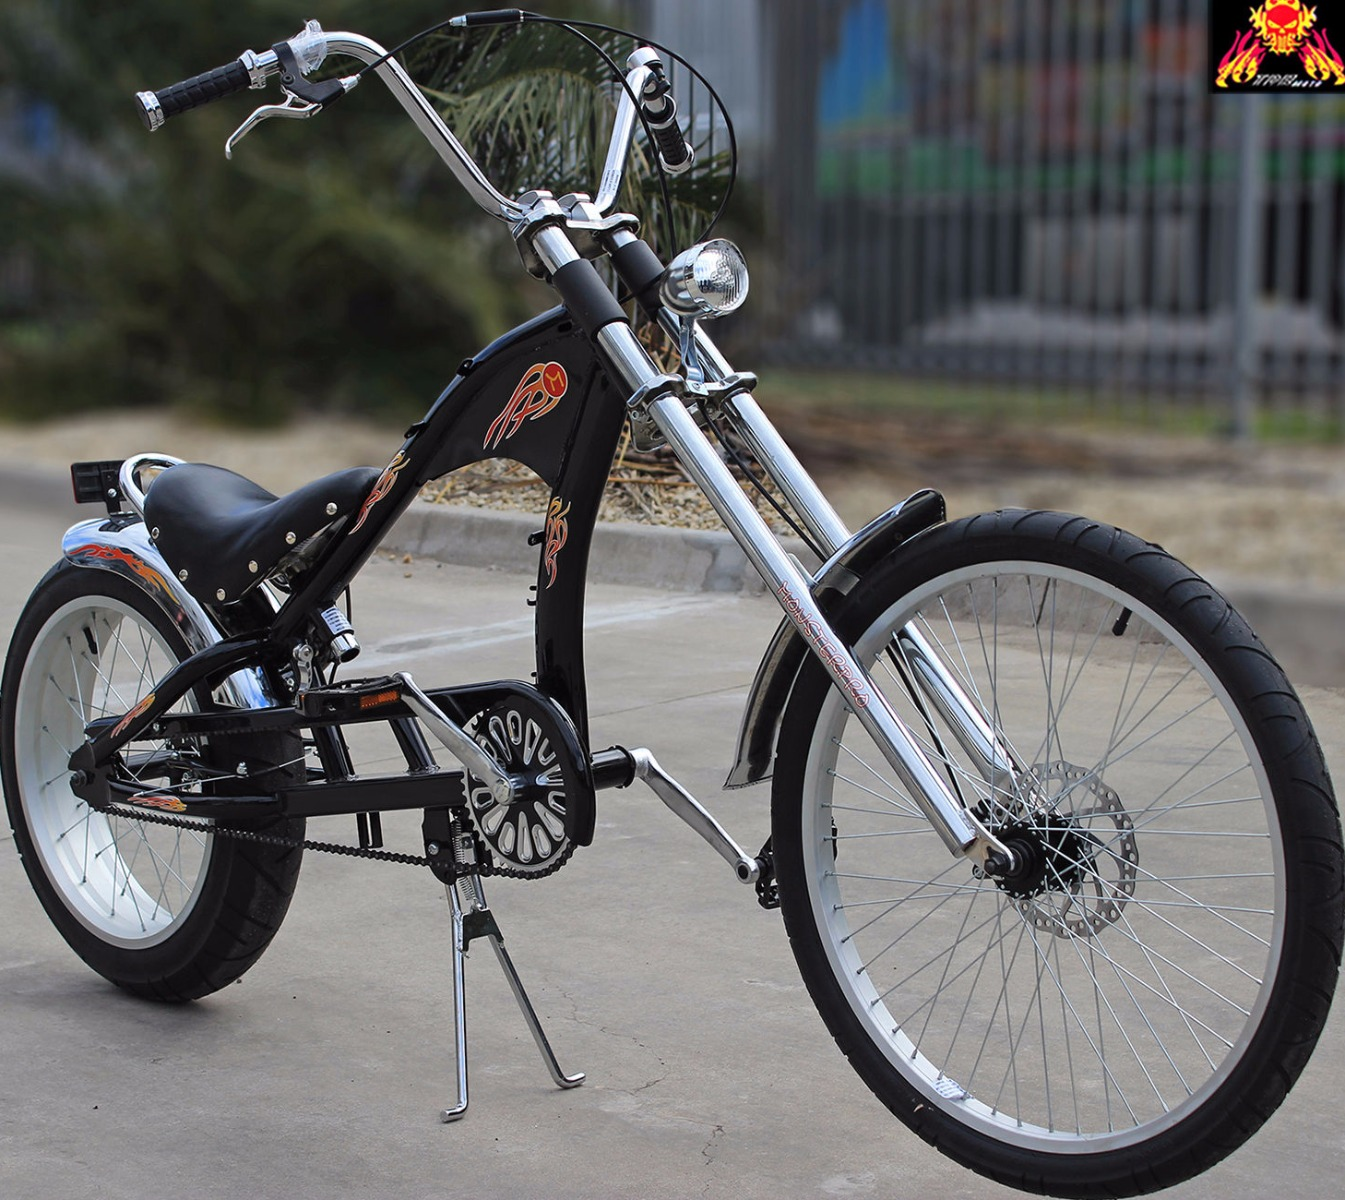 Chopper Bicycle Motorised 80cc Engine Electric Push Bike E Bike